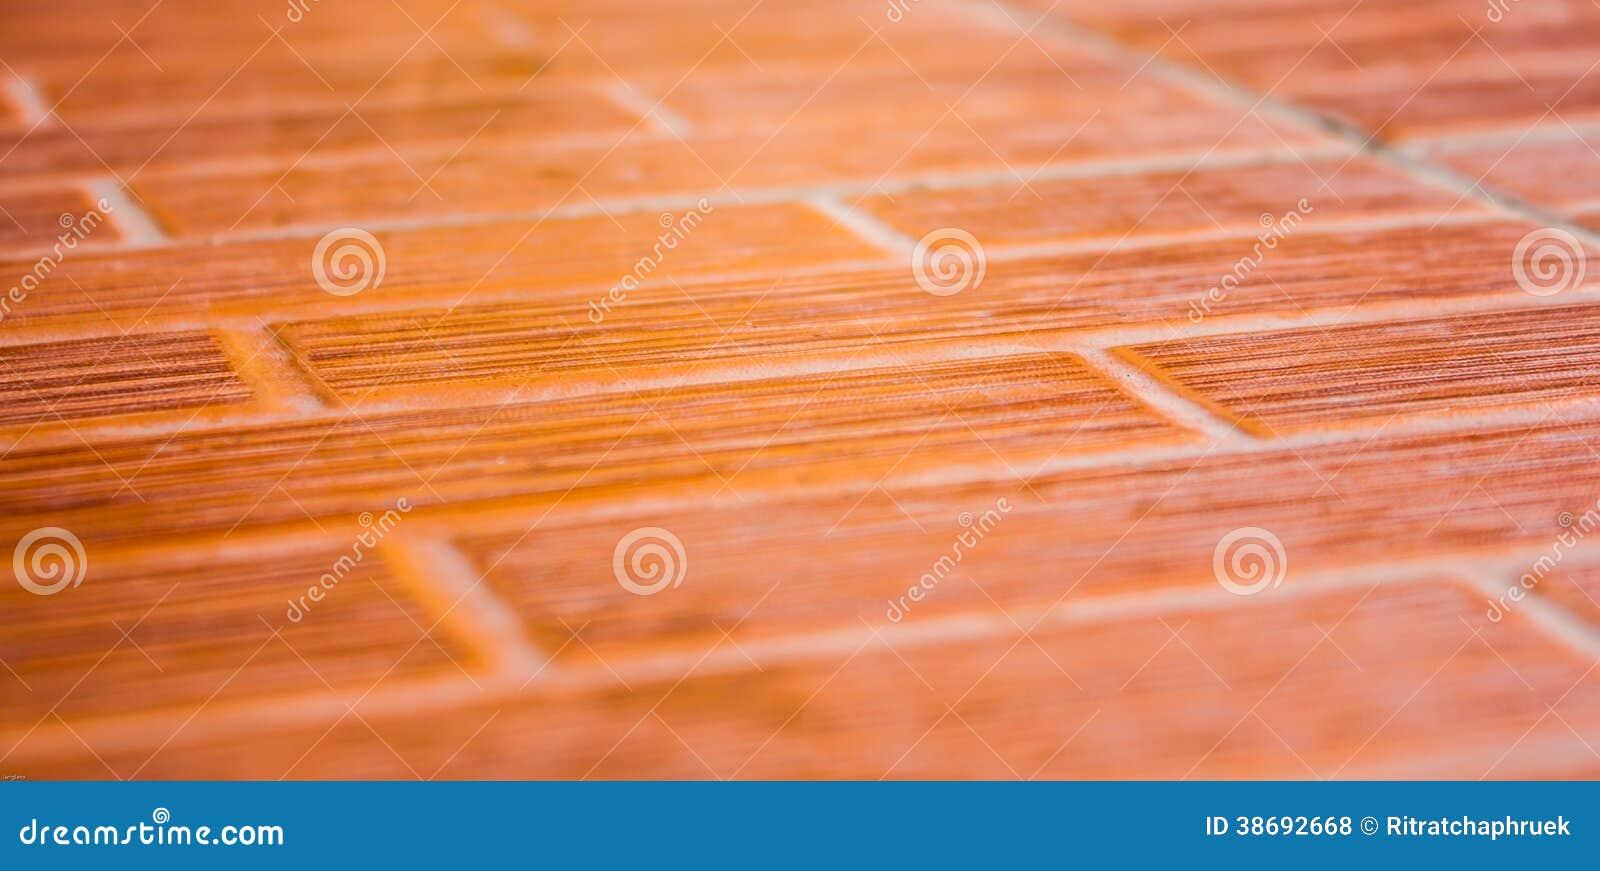 Orange Ceramic Tile Floor Stock Photo Image Of Fret 38692668